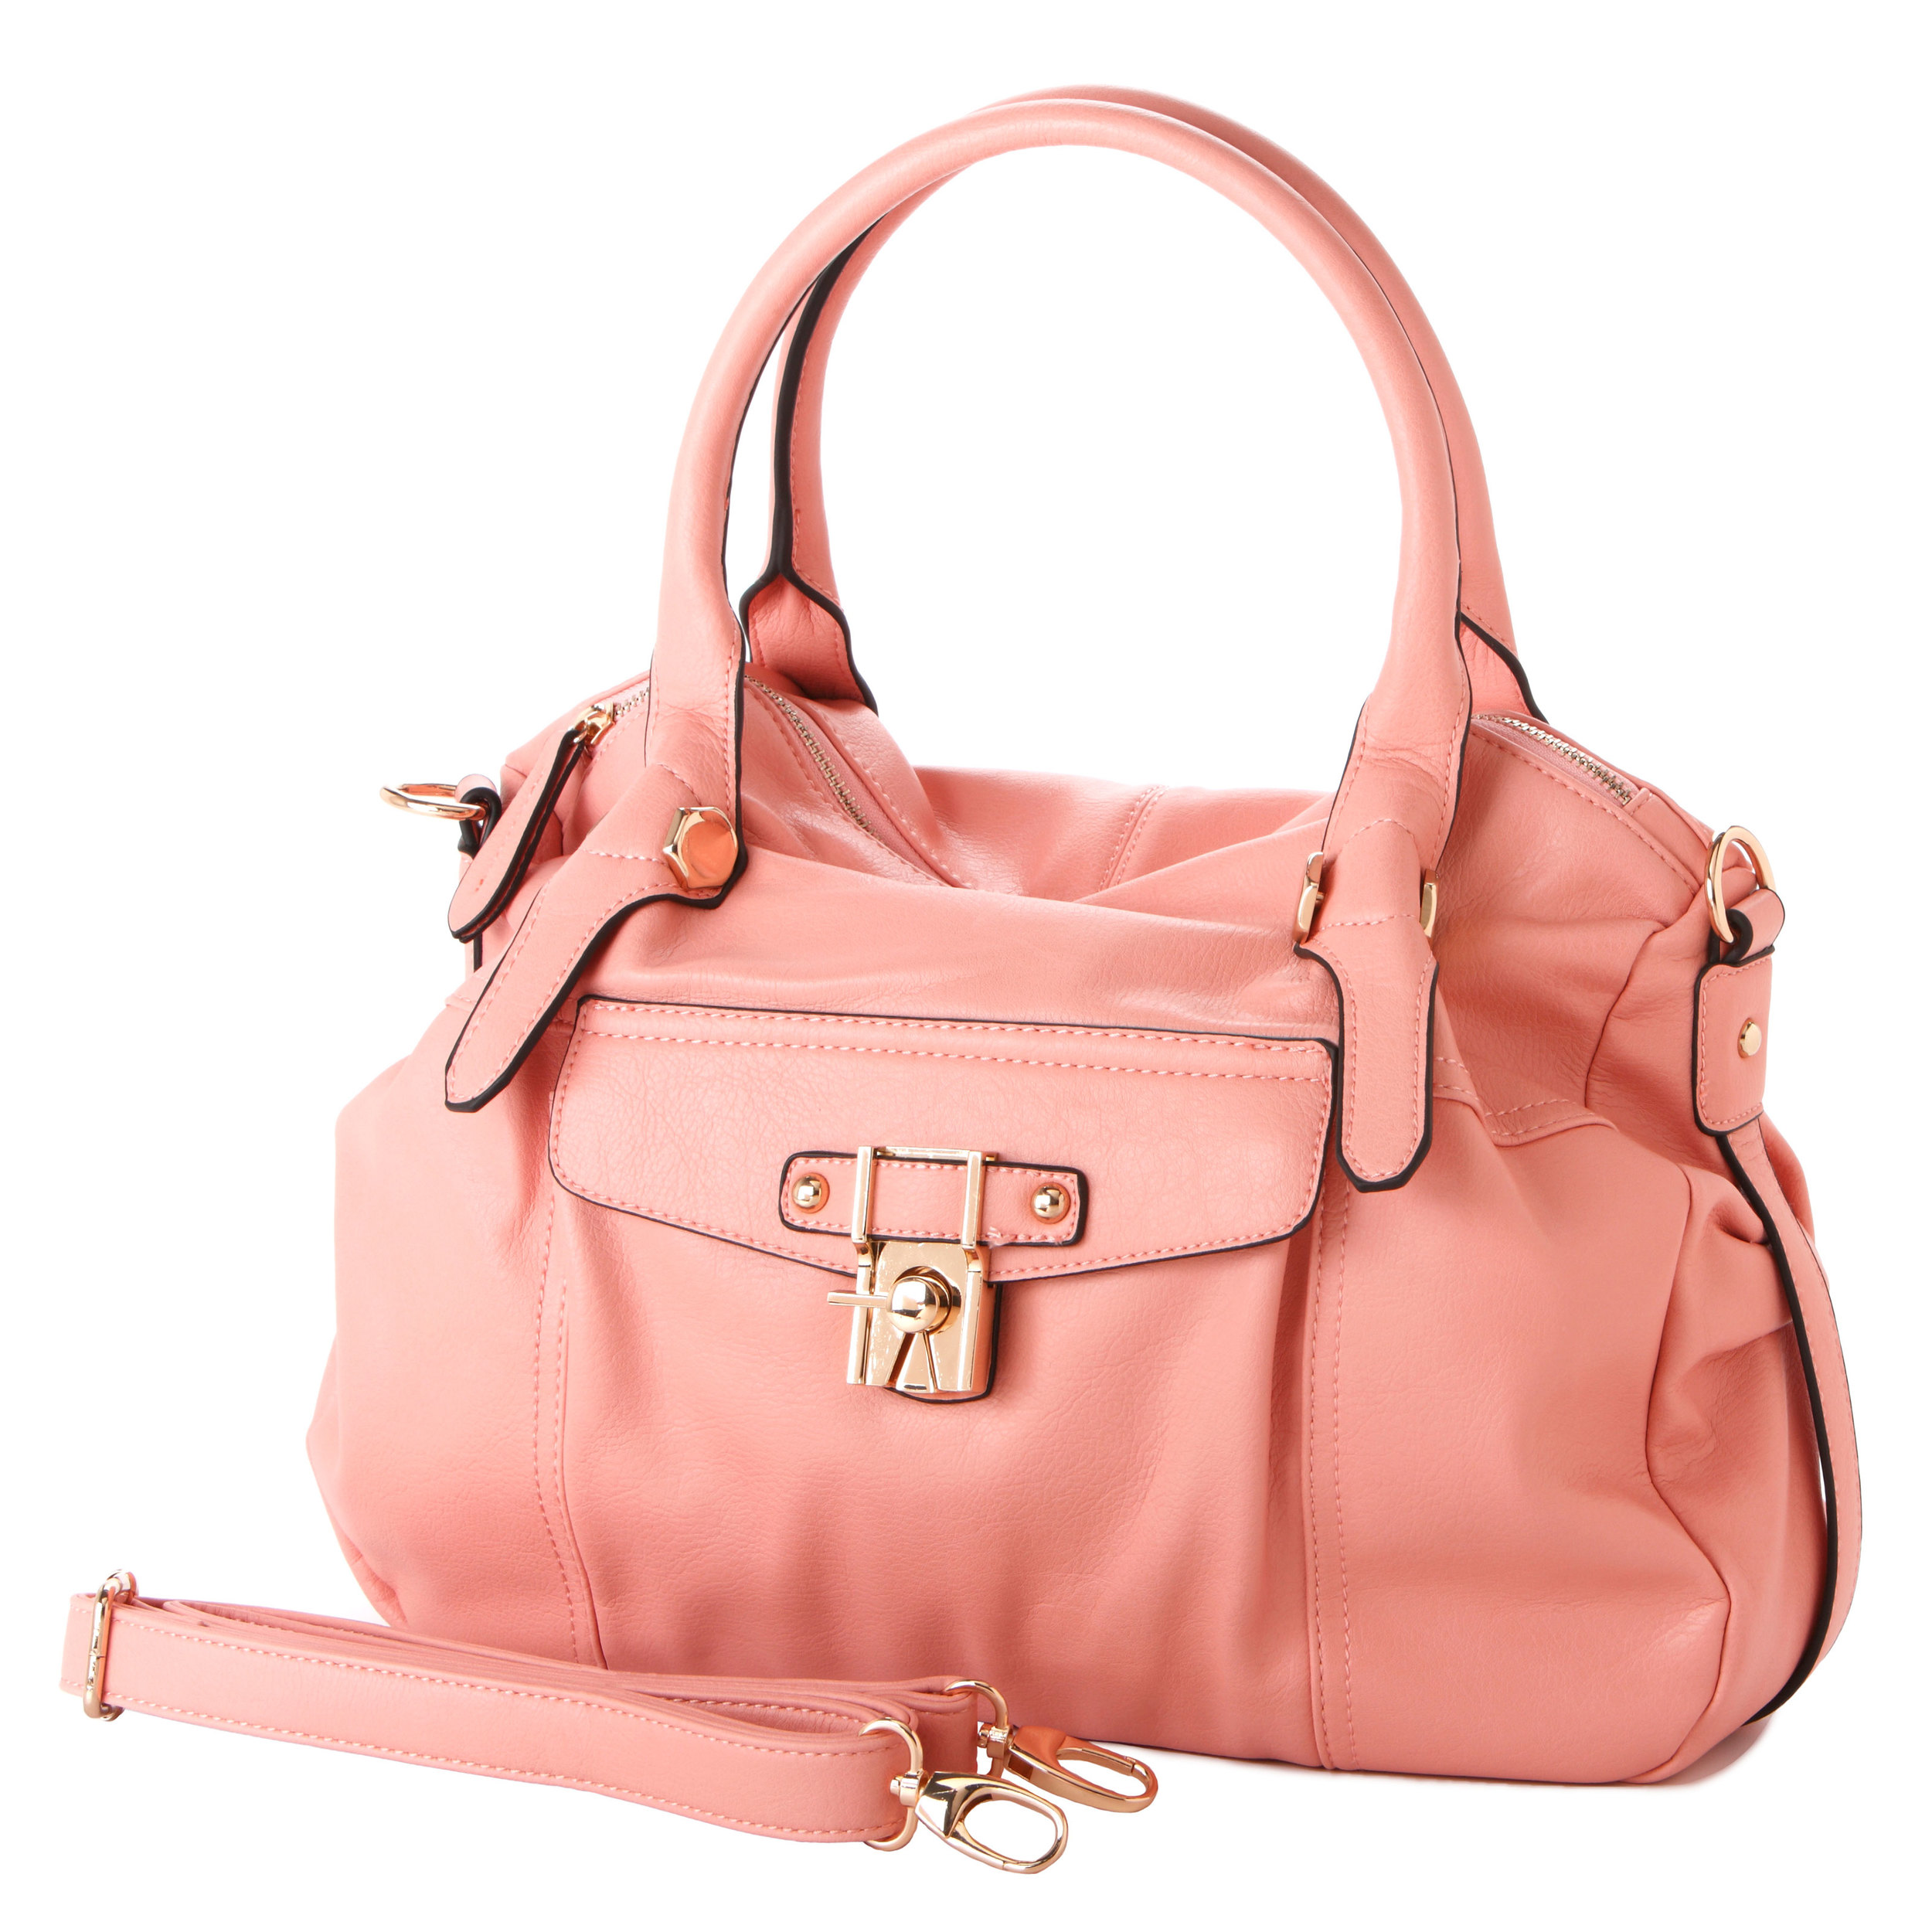 CAME Pink Office Tote Style Satchel Handbag Main image